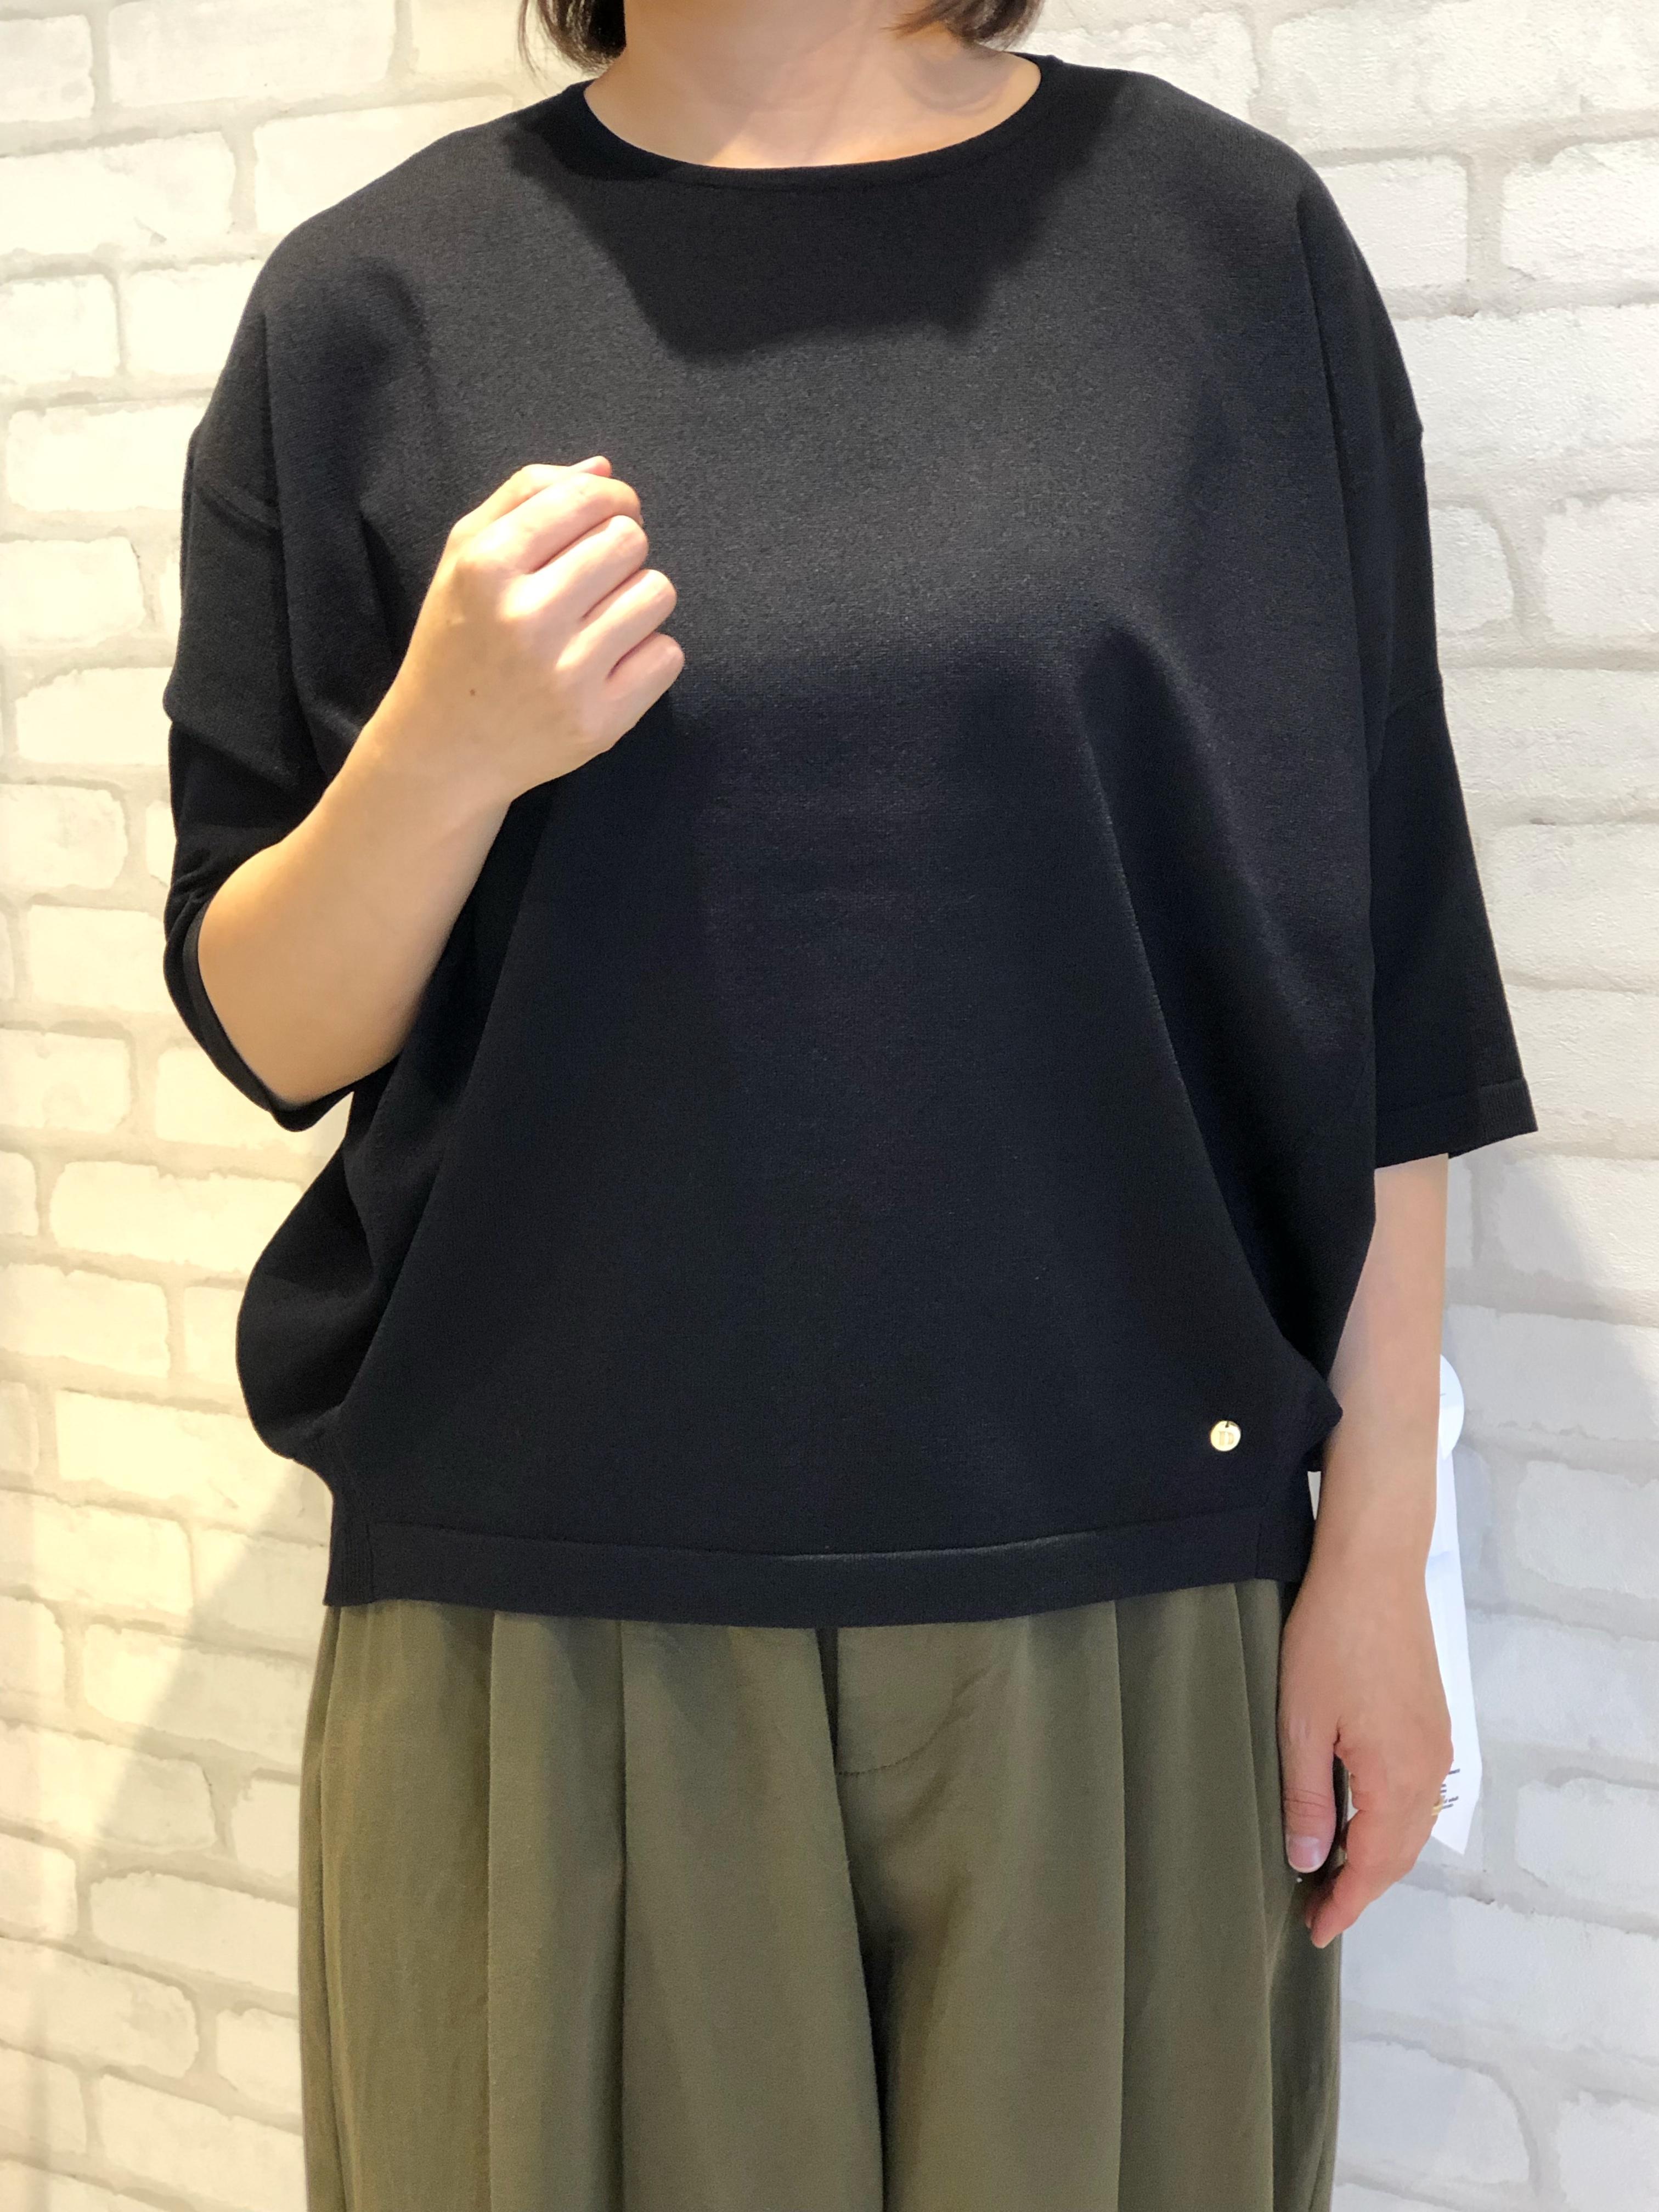 Dignite collier/802331/5分袖ウォッシャブルニット(ブラック)